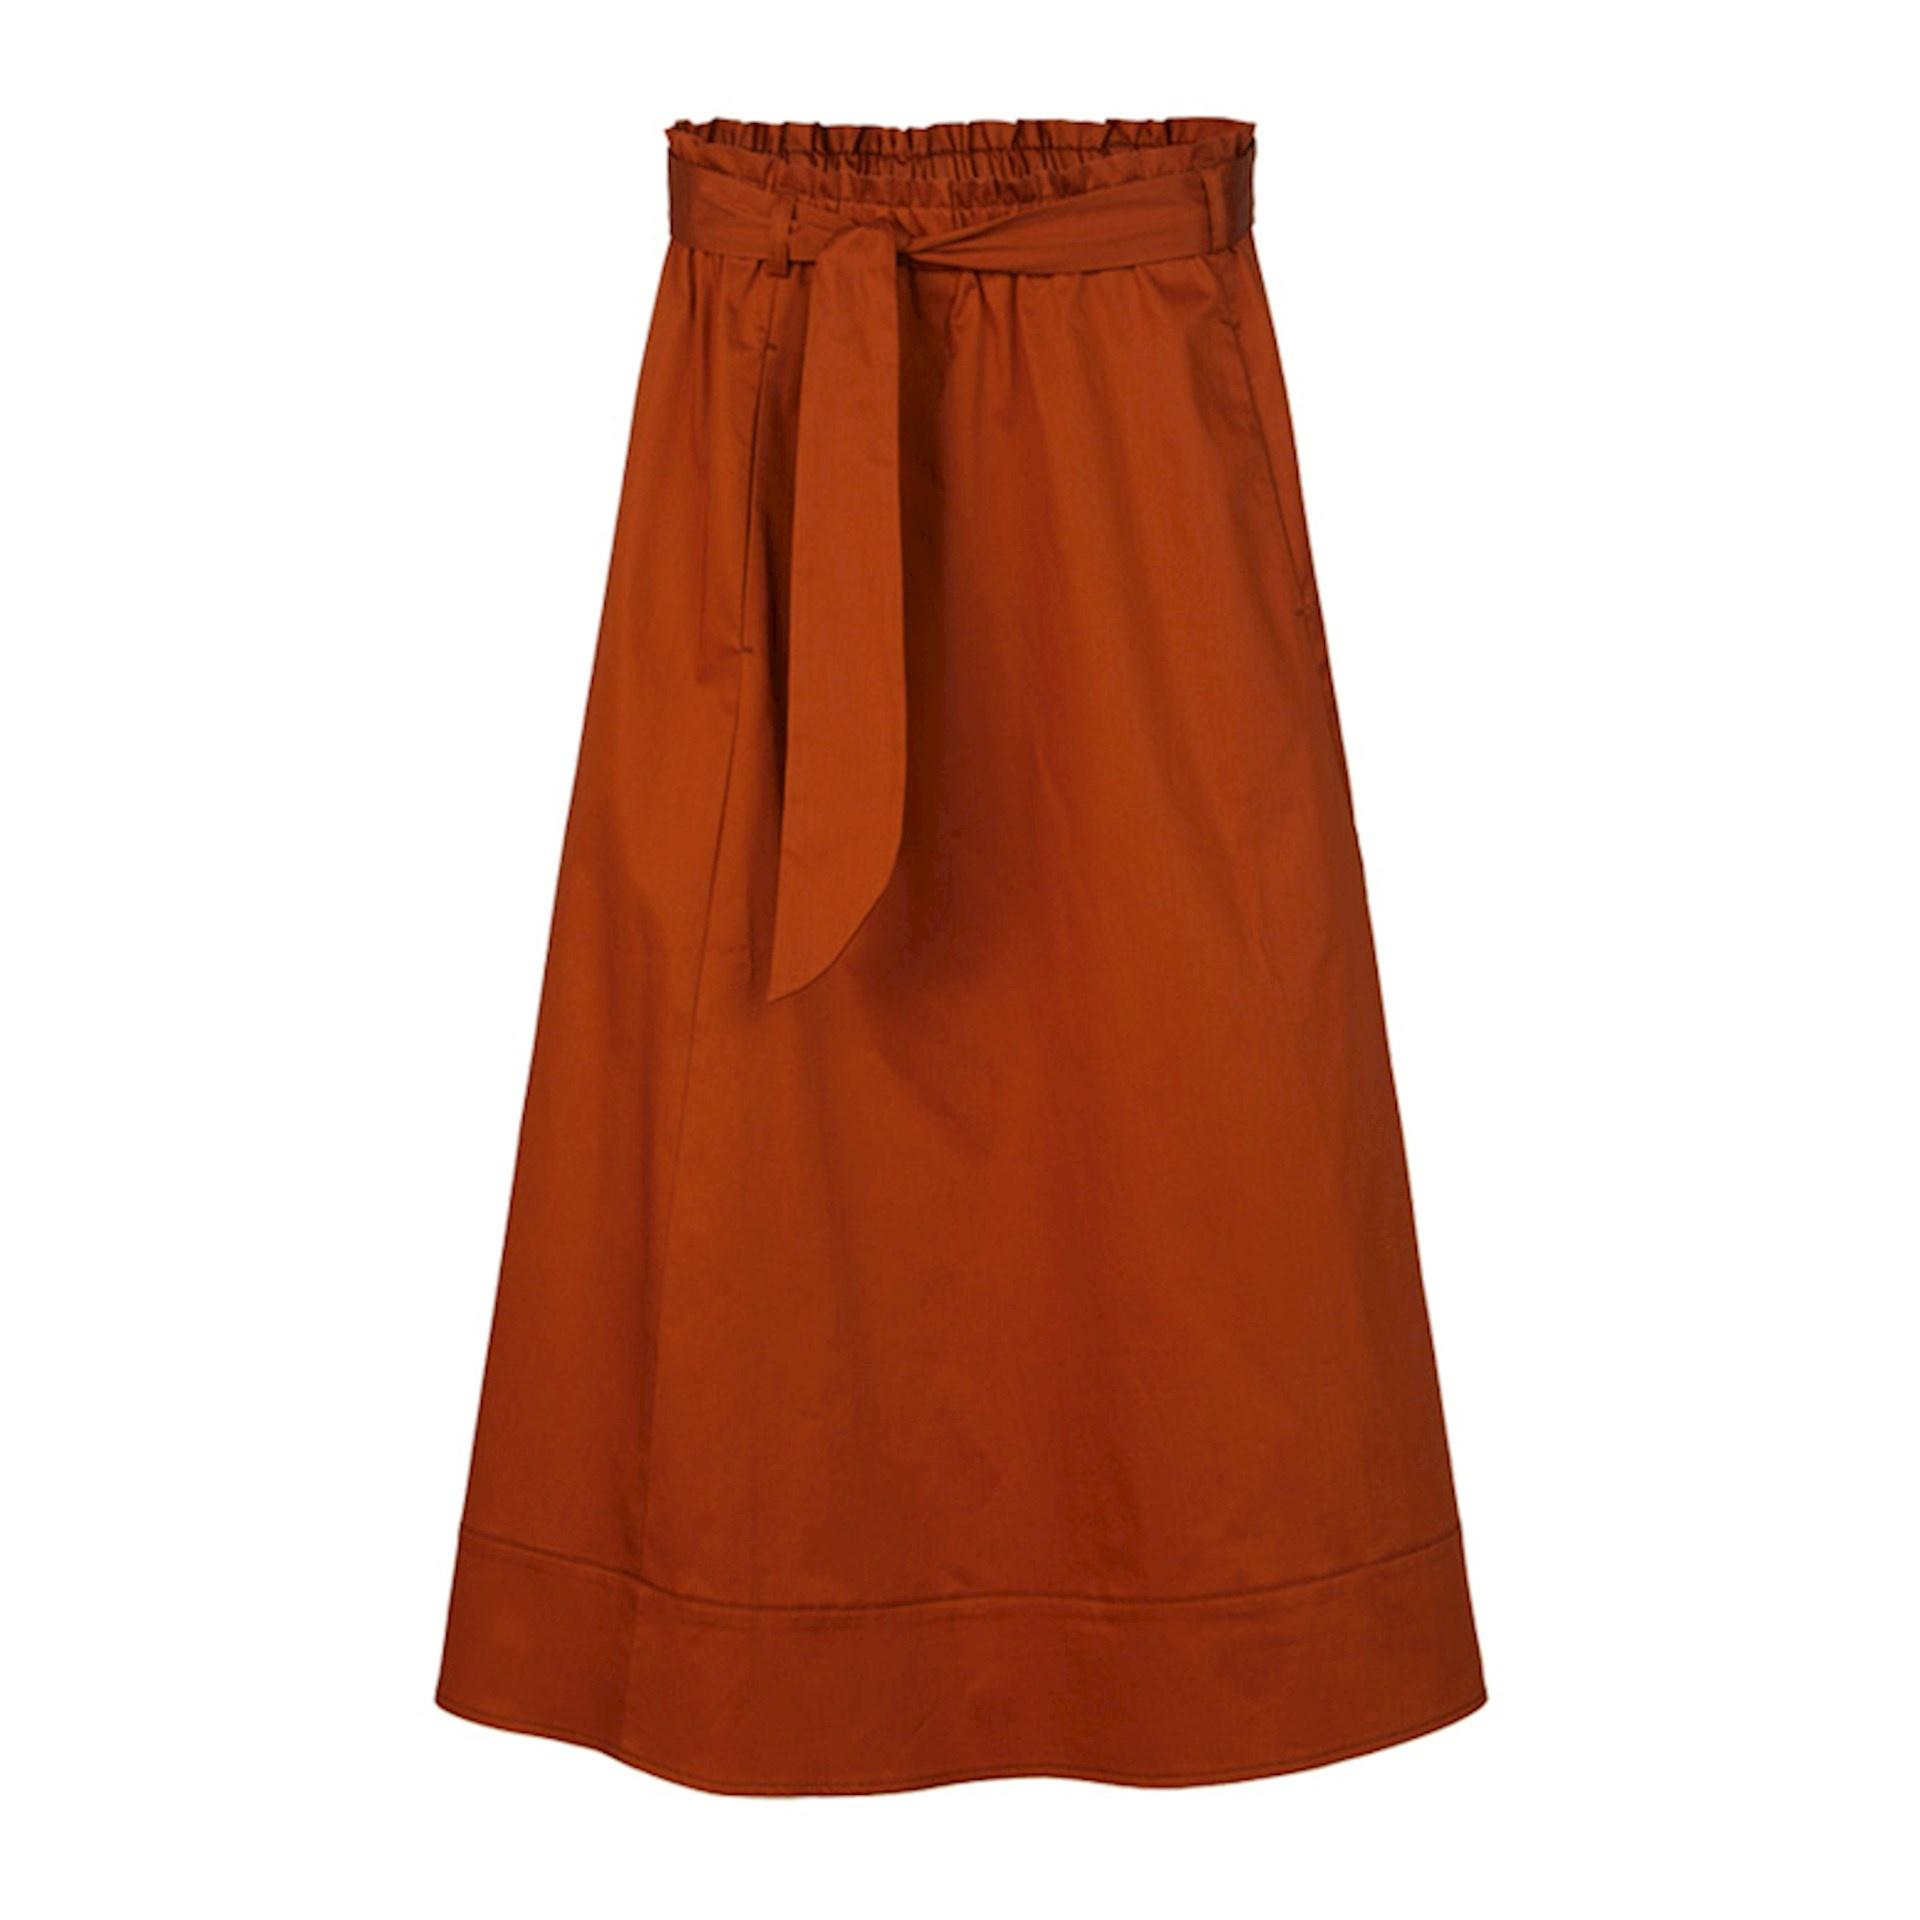 Summum Skirt 6S1197-11381C3-1